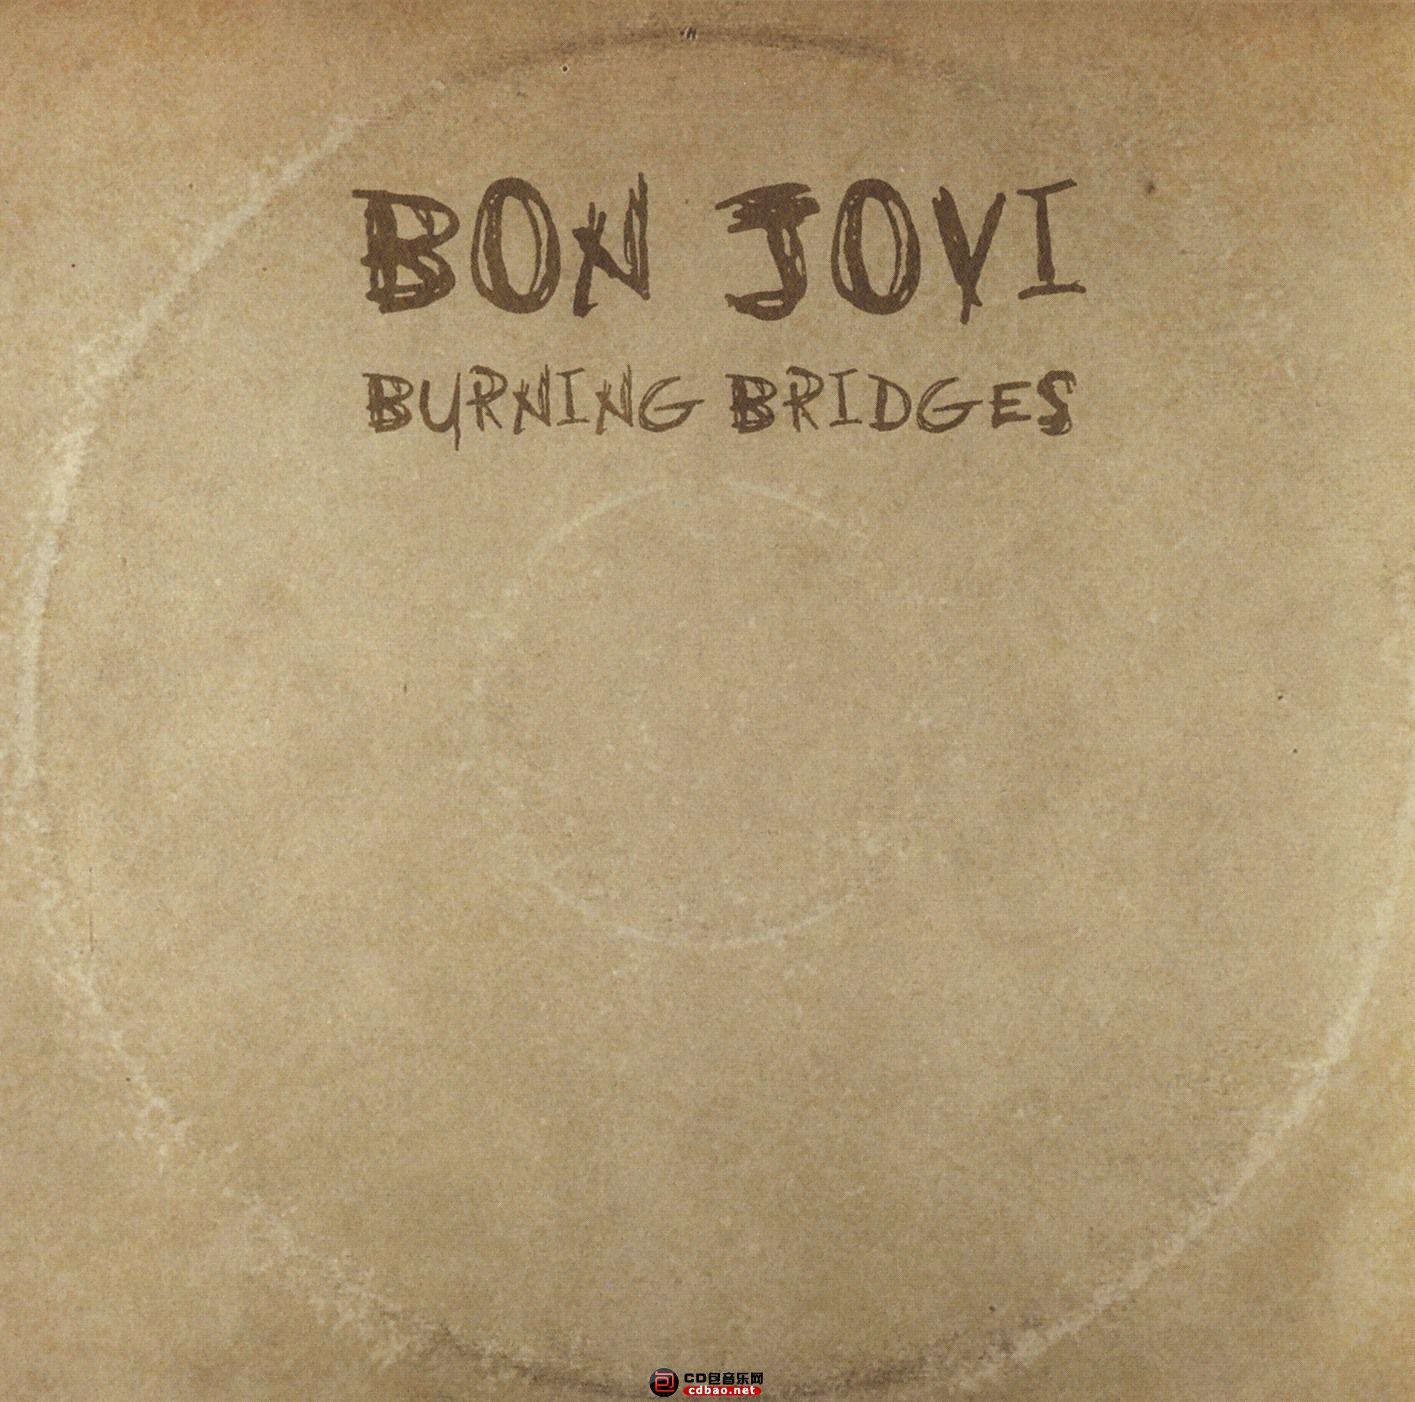 Bon Jovi - Burning Bridges - Front.jpg